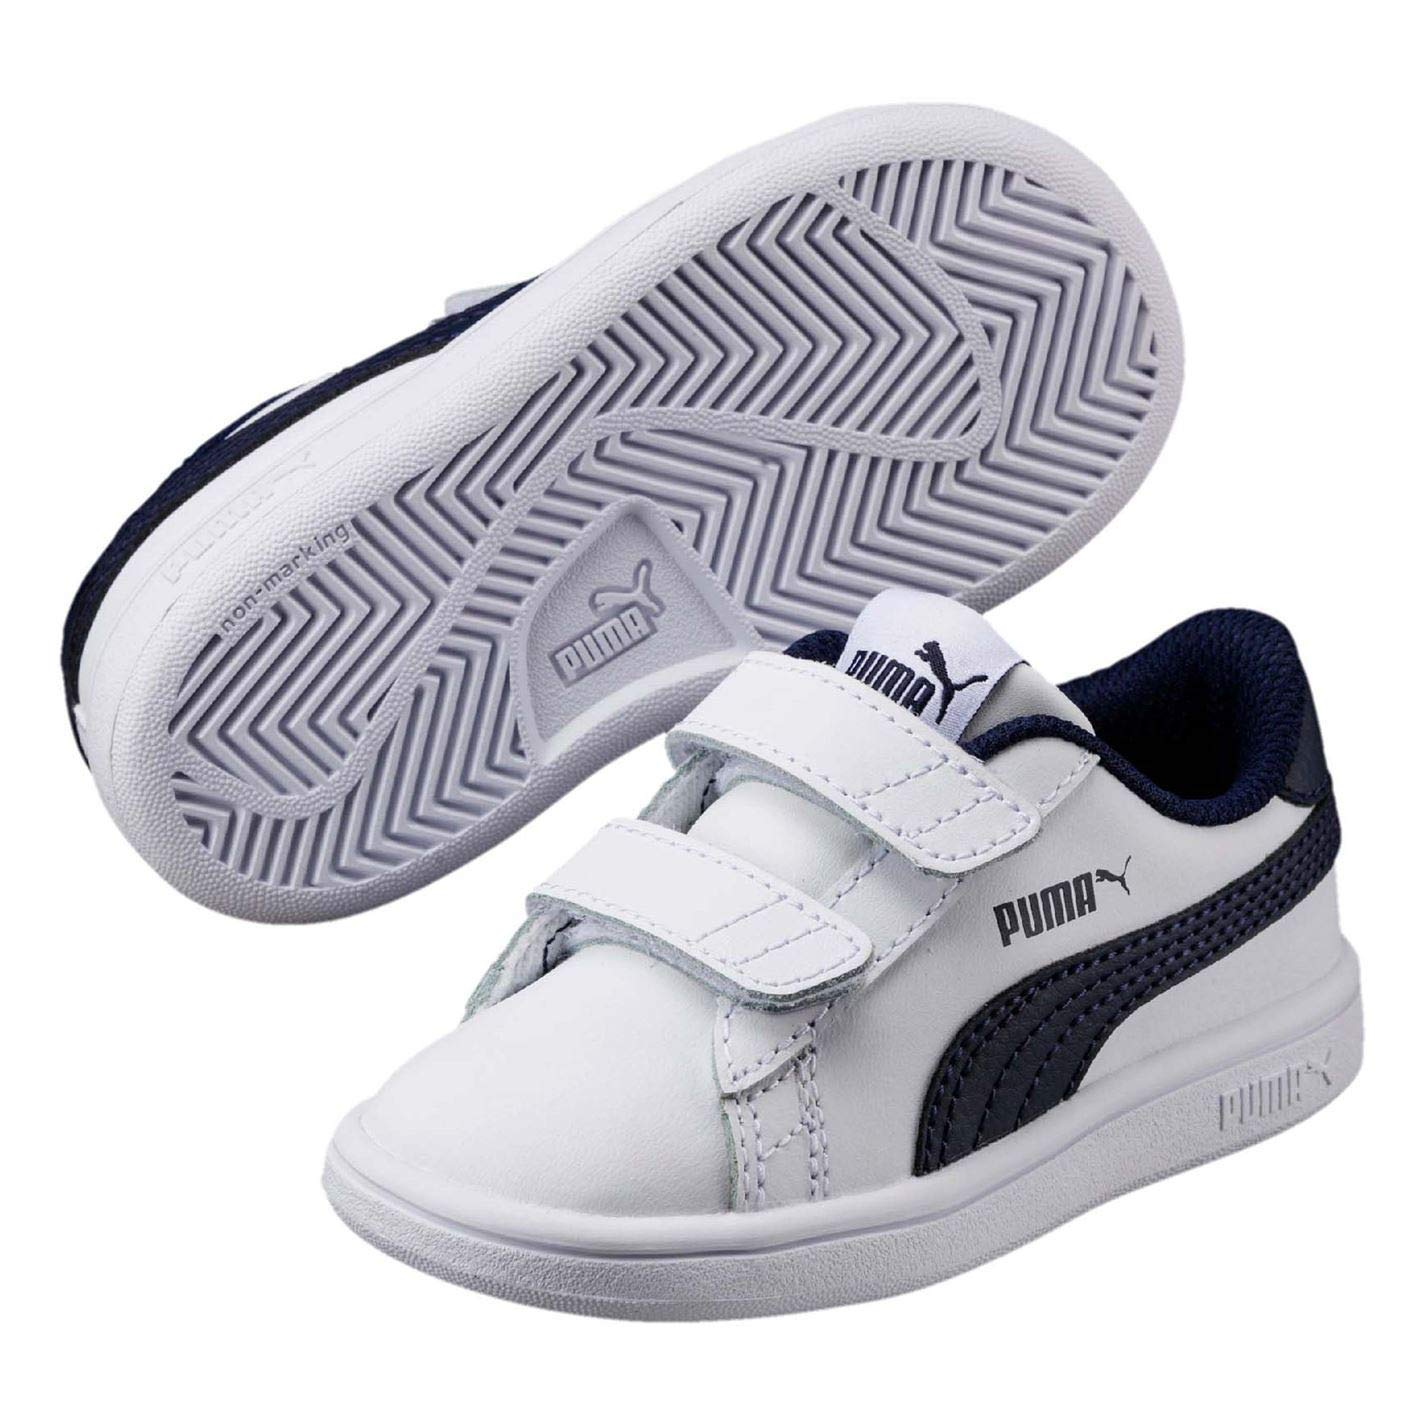 23a91f4e10298 Amazon.com: Puma Smash Suede Fun Court Trainers Infant Boys Shoes ...